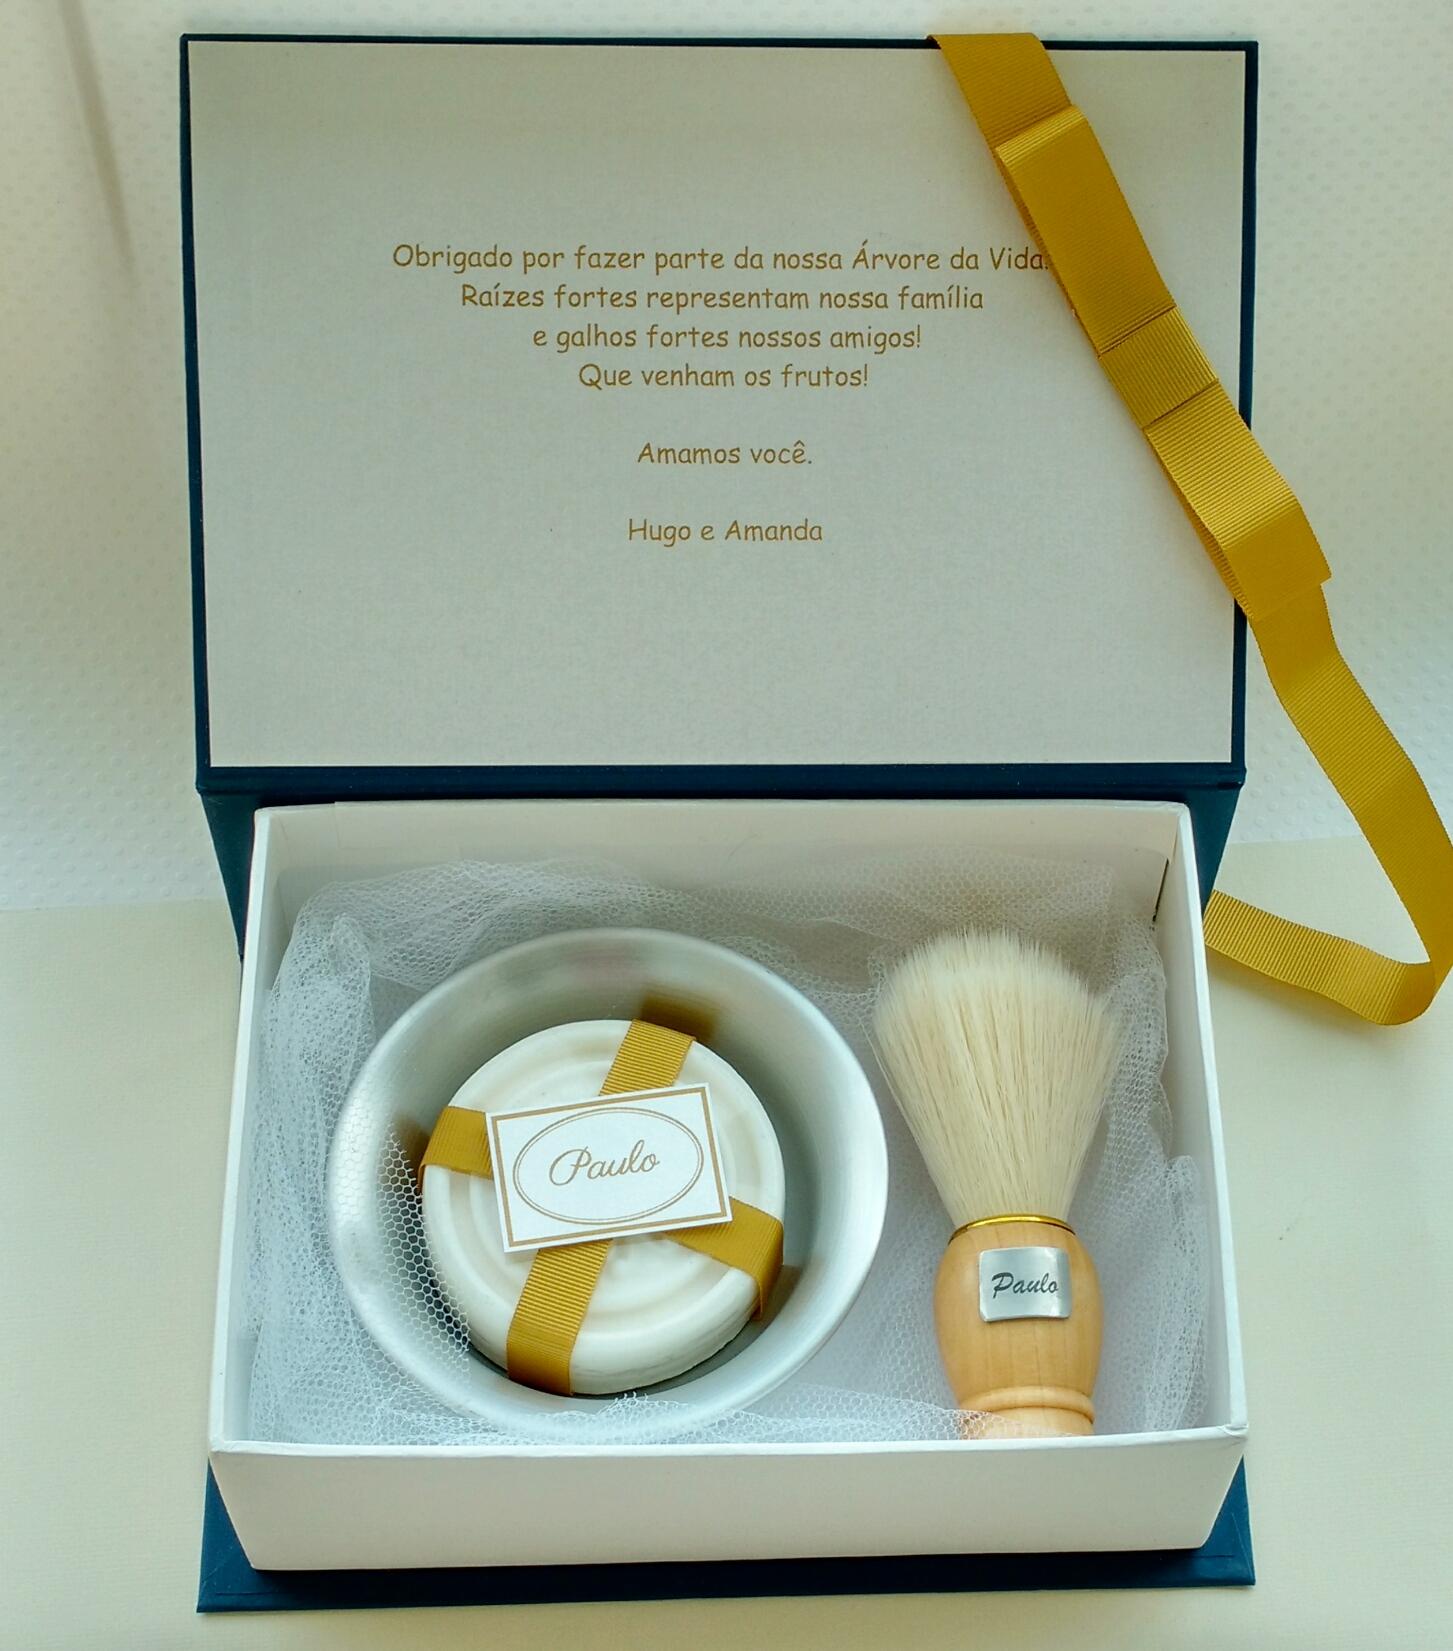 convite_padrinhos_diferentes_kit de barbear